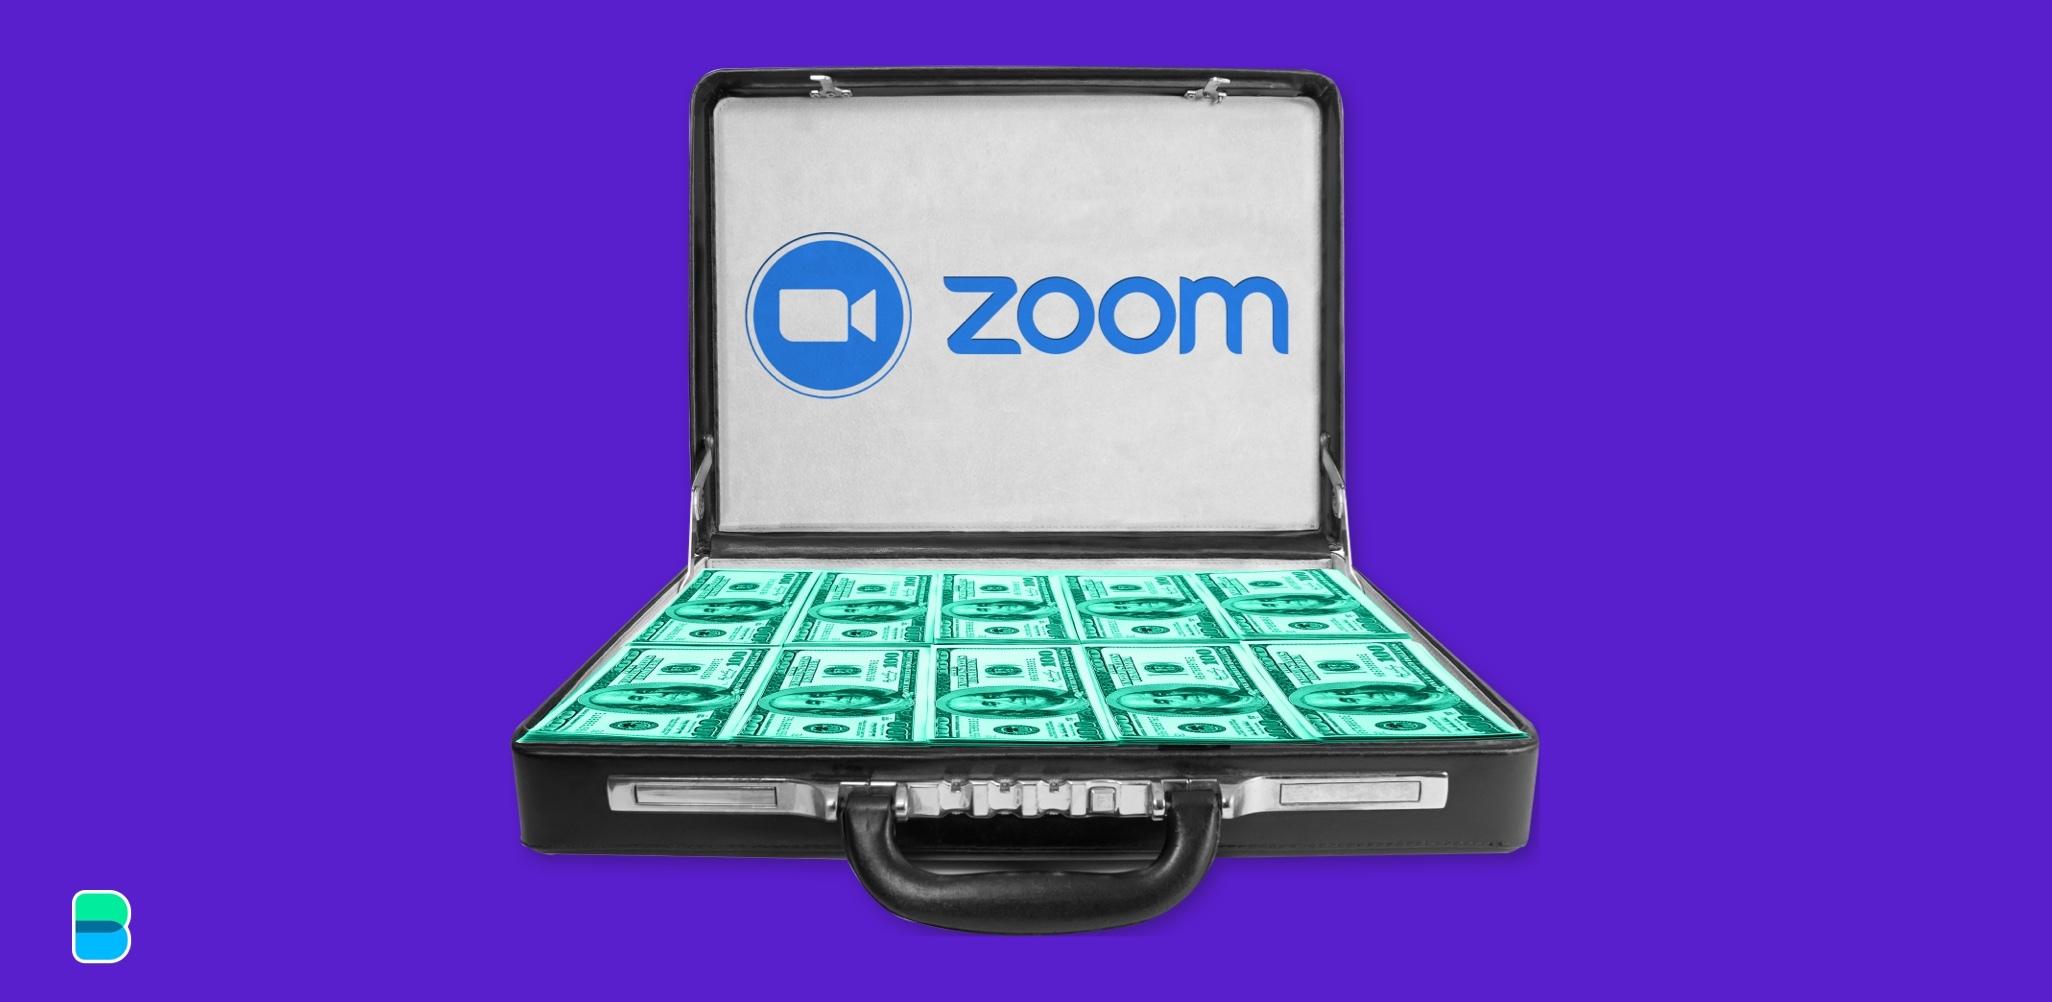 A billion-dollar quarter for Zoom